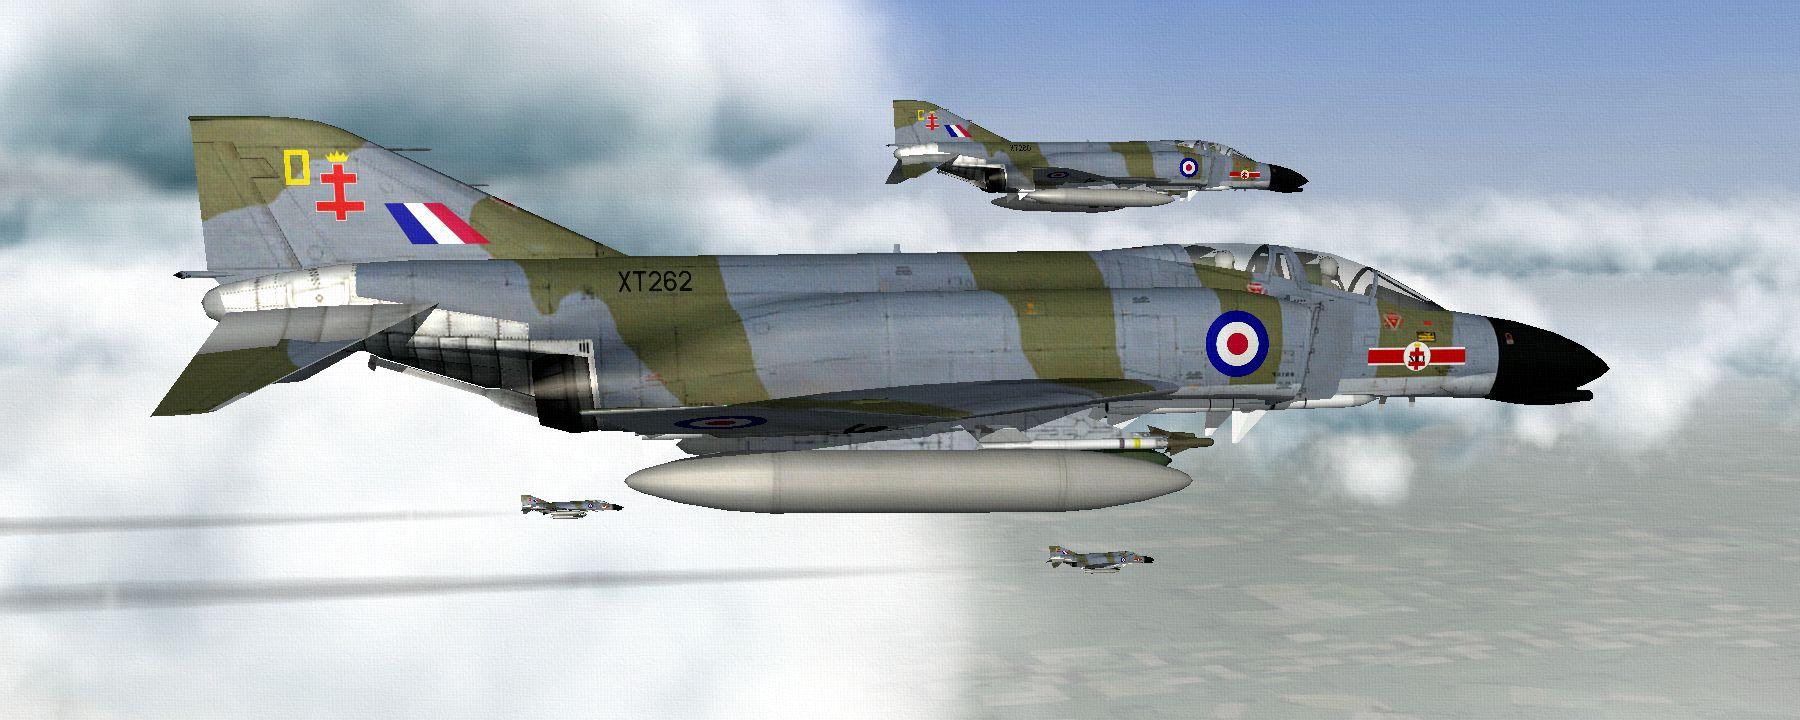 RAF%20PHANTOM%20FG2.05_zps1xdk6puz.jpg